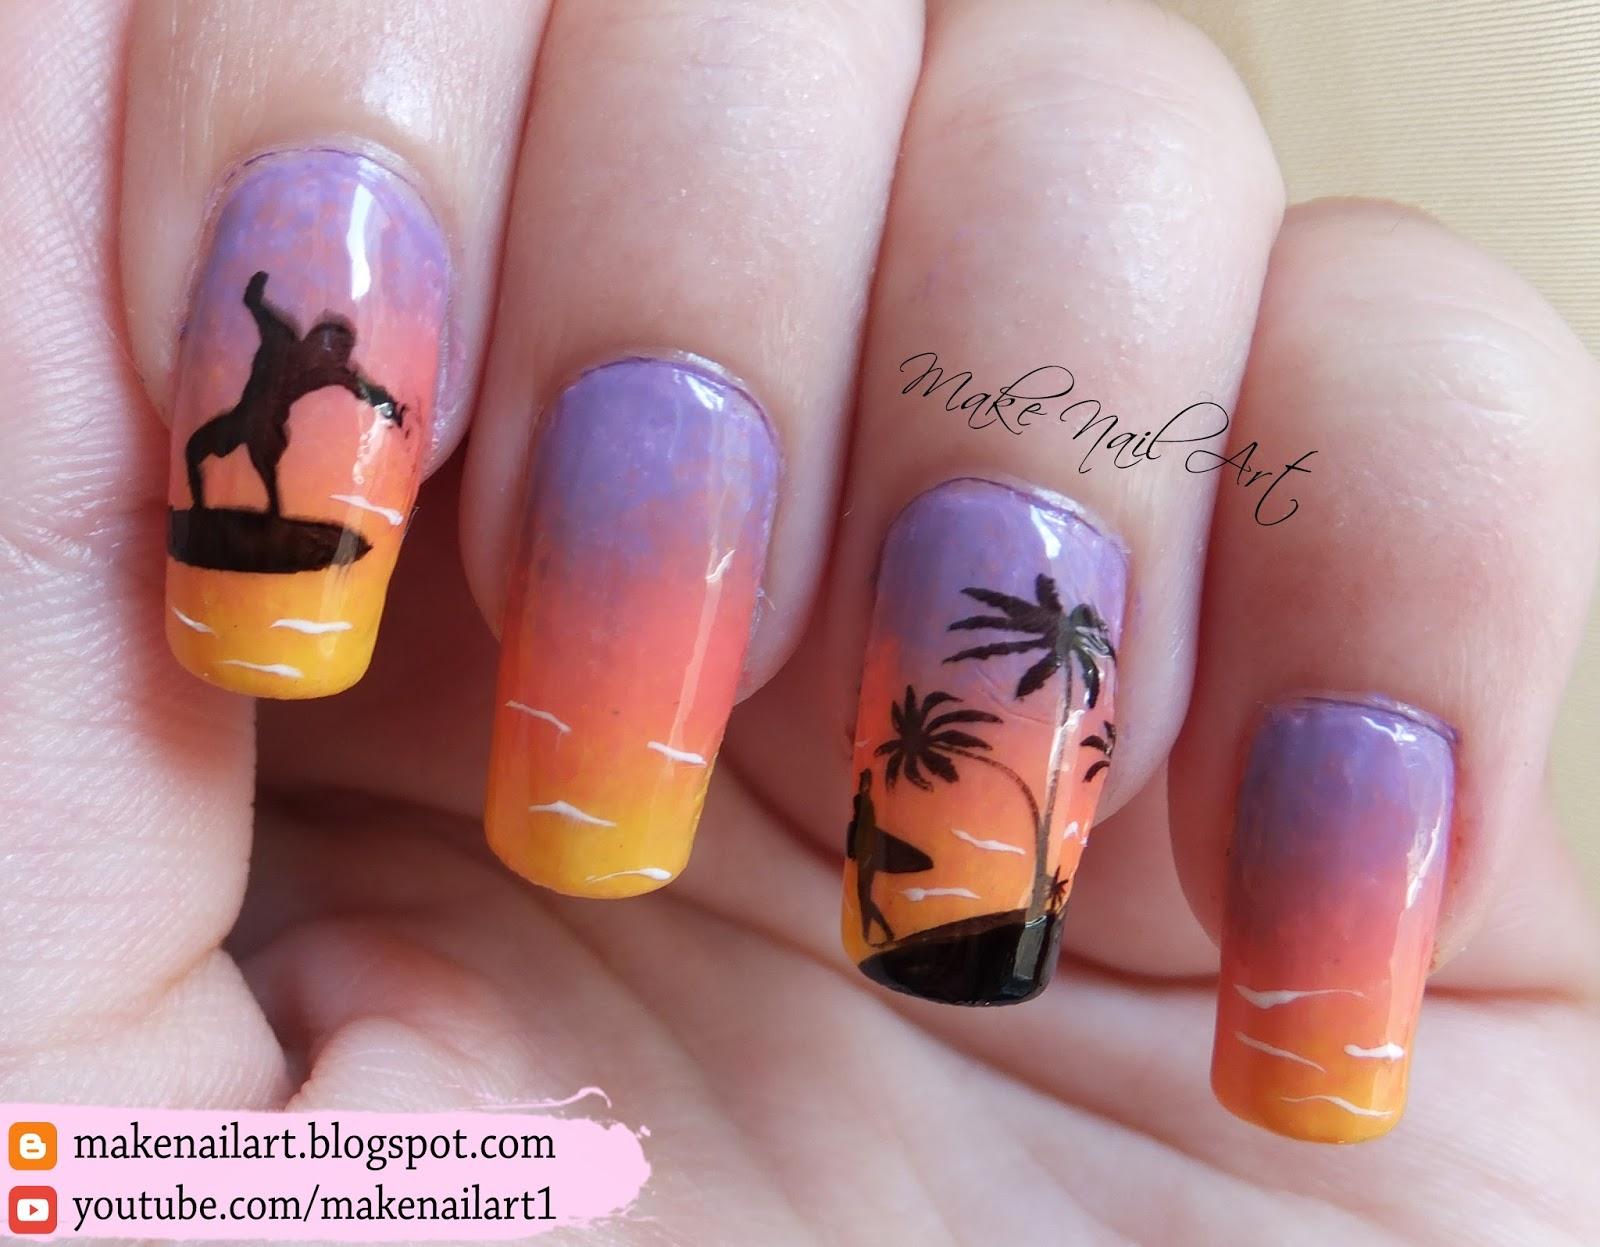 Summer Sea Sunset Stamping Nail Art Design Tutorial - Make Nail Art